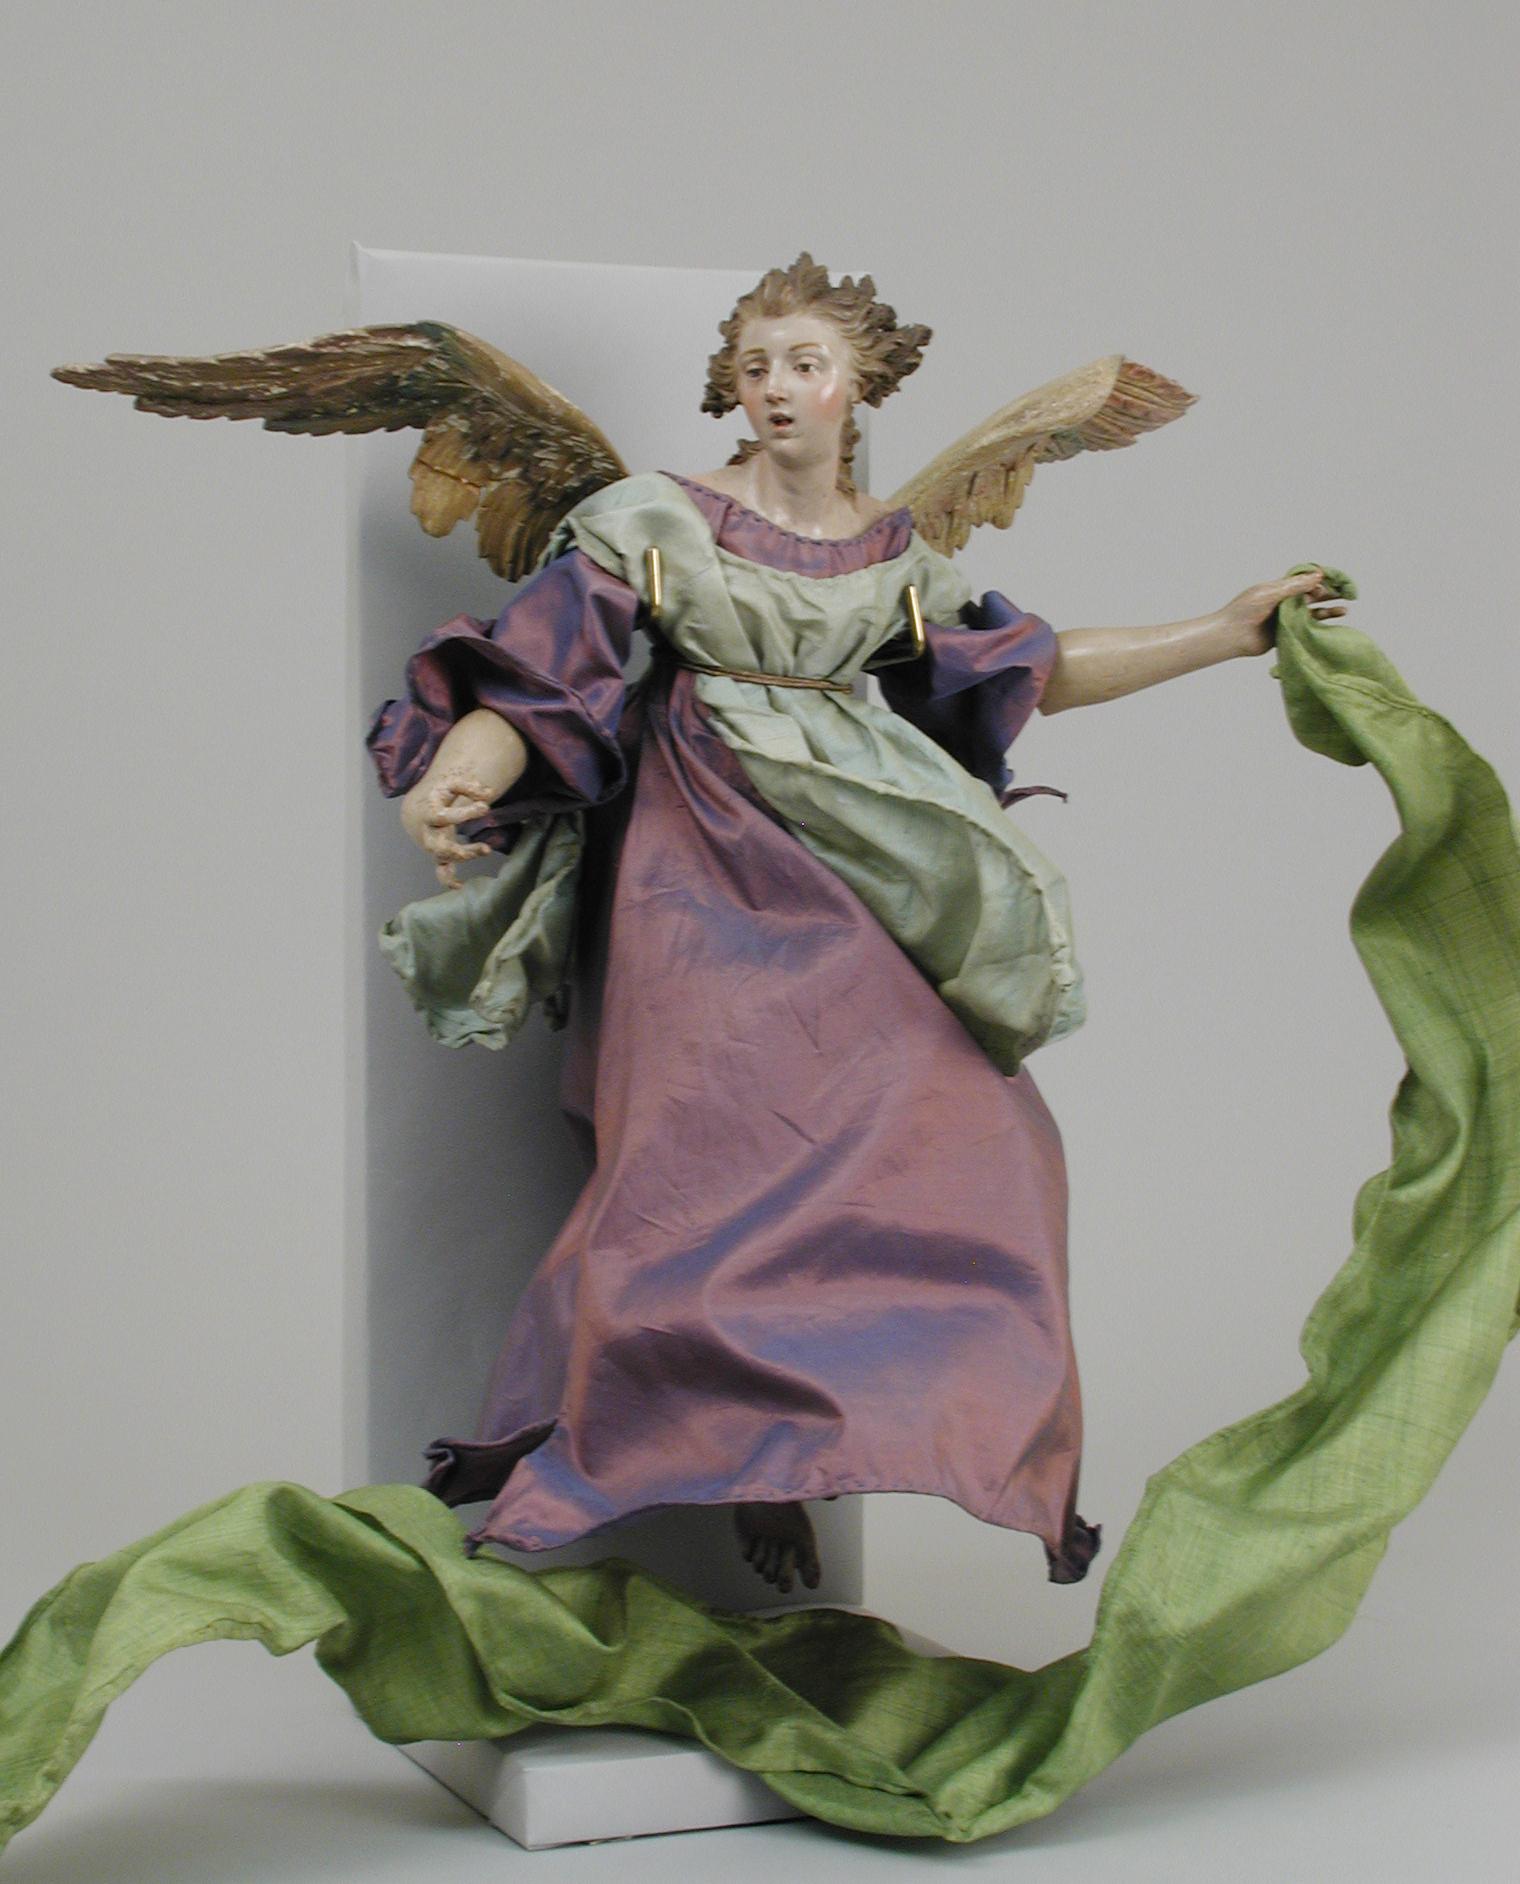 https://images.metmuseum.org/CRDImages/es/original/LC-64_164_11.jpg